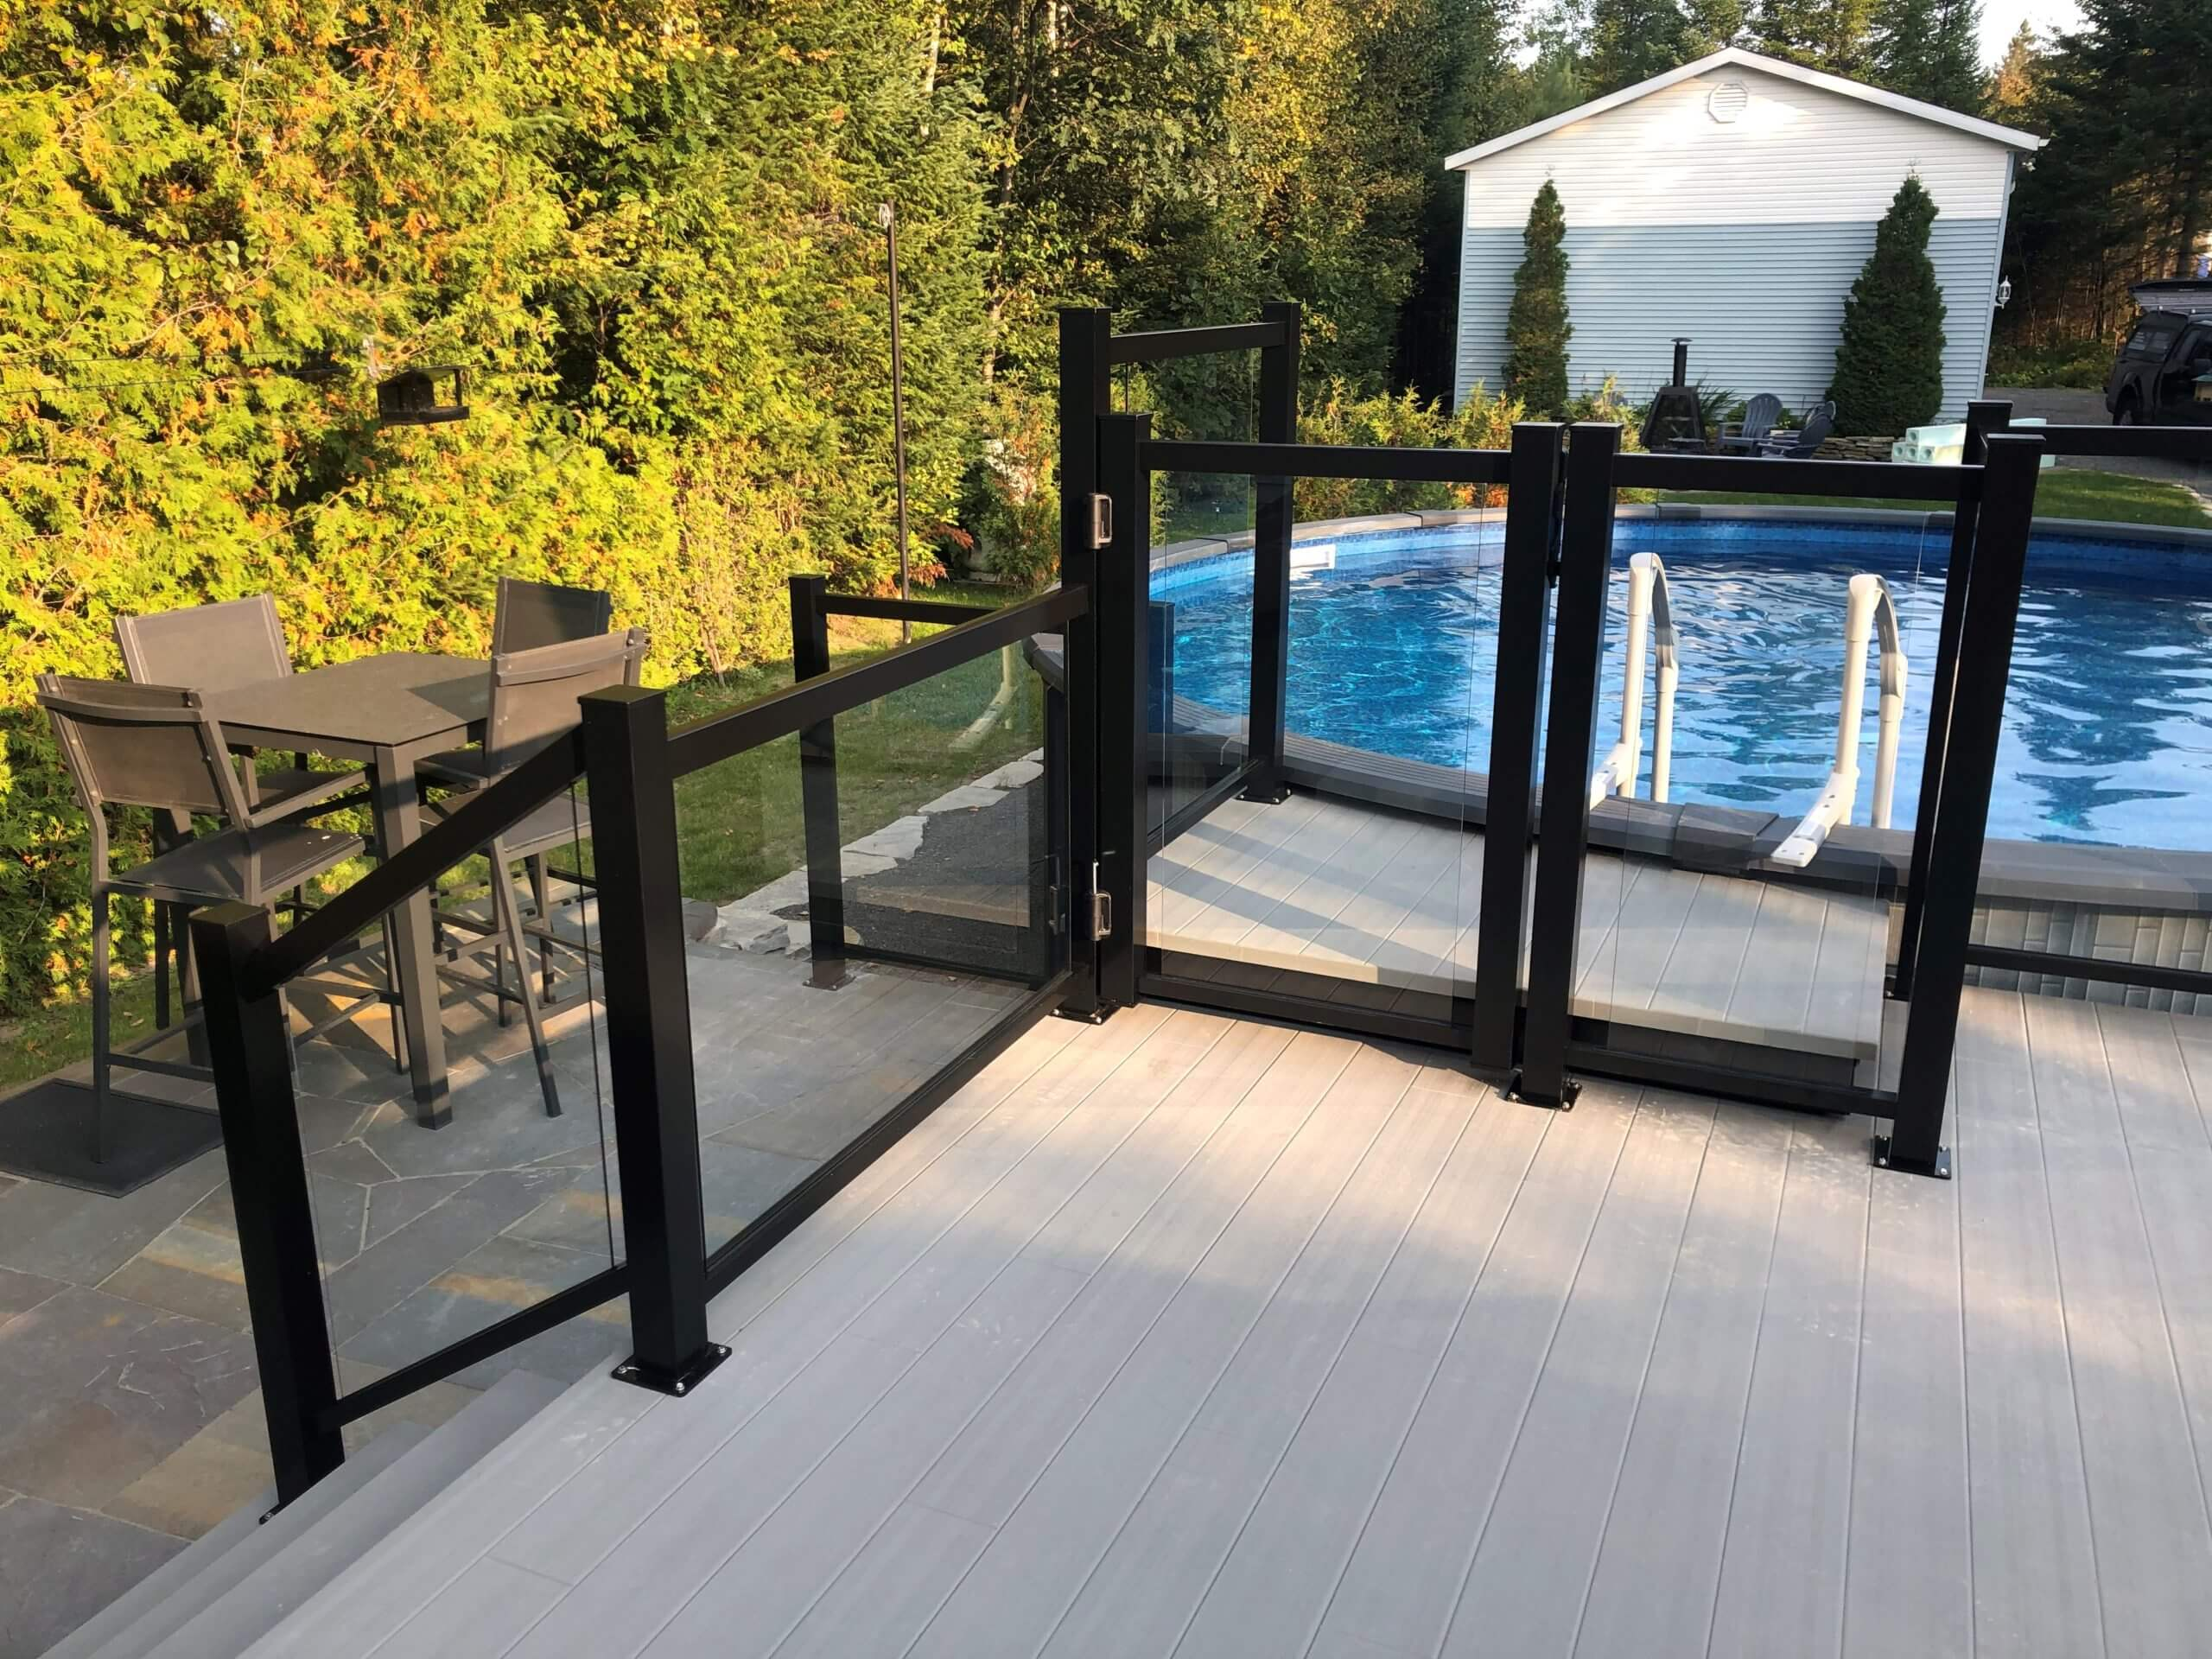 clôture de piscine en verre et aluminium